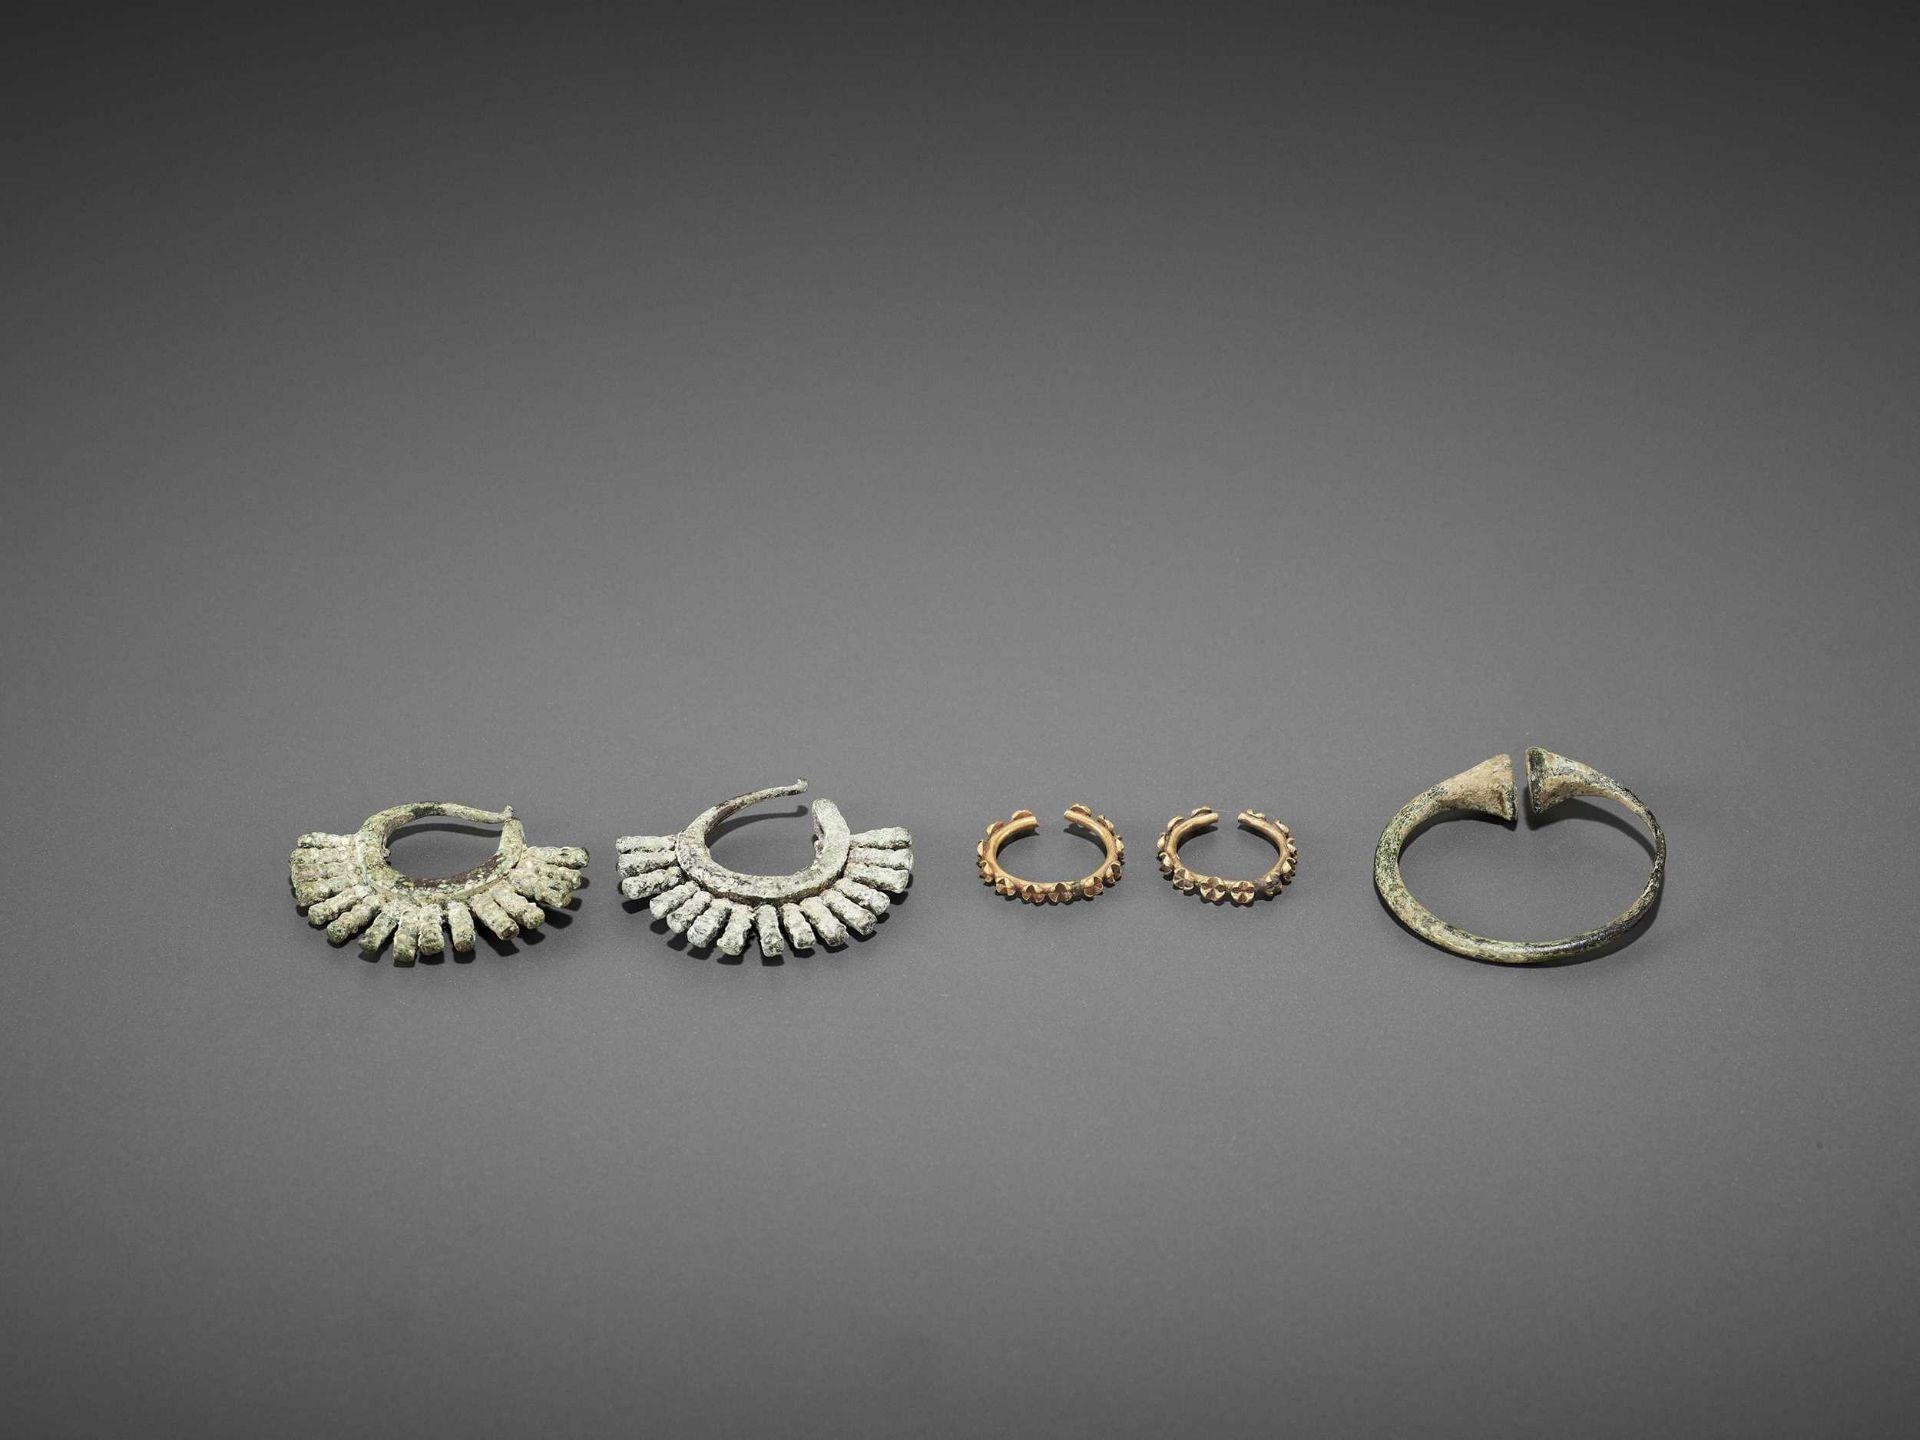 FIVE BACTRIAN GOLD AND BRONZE EARRINGS - Bild 3 aus 6